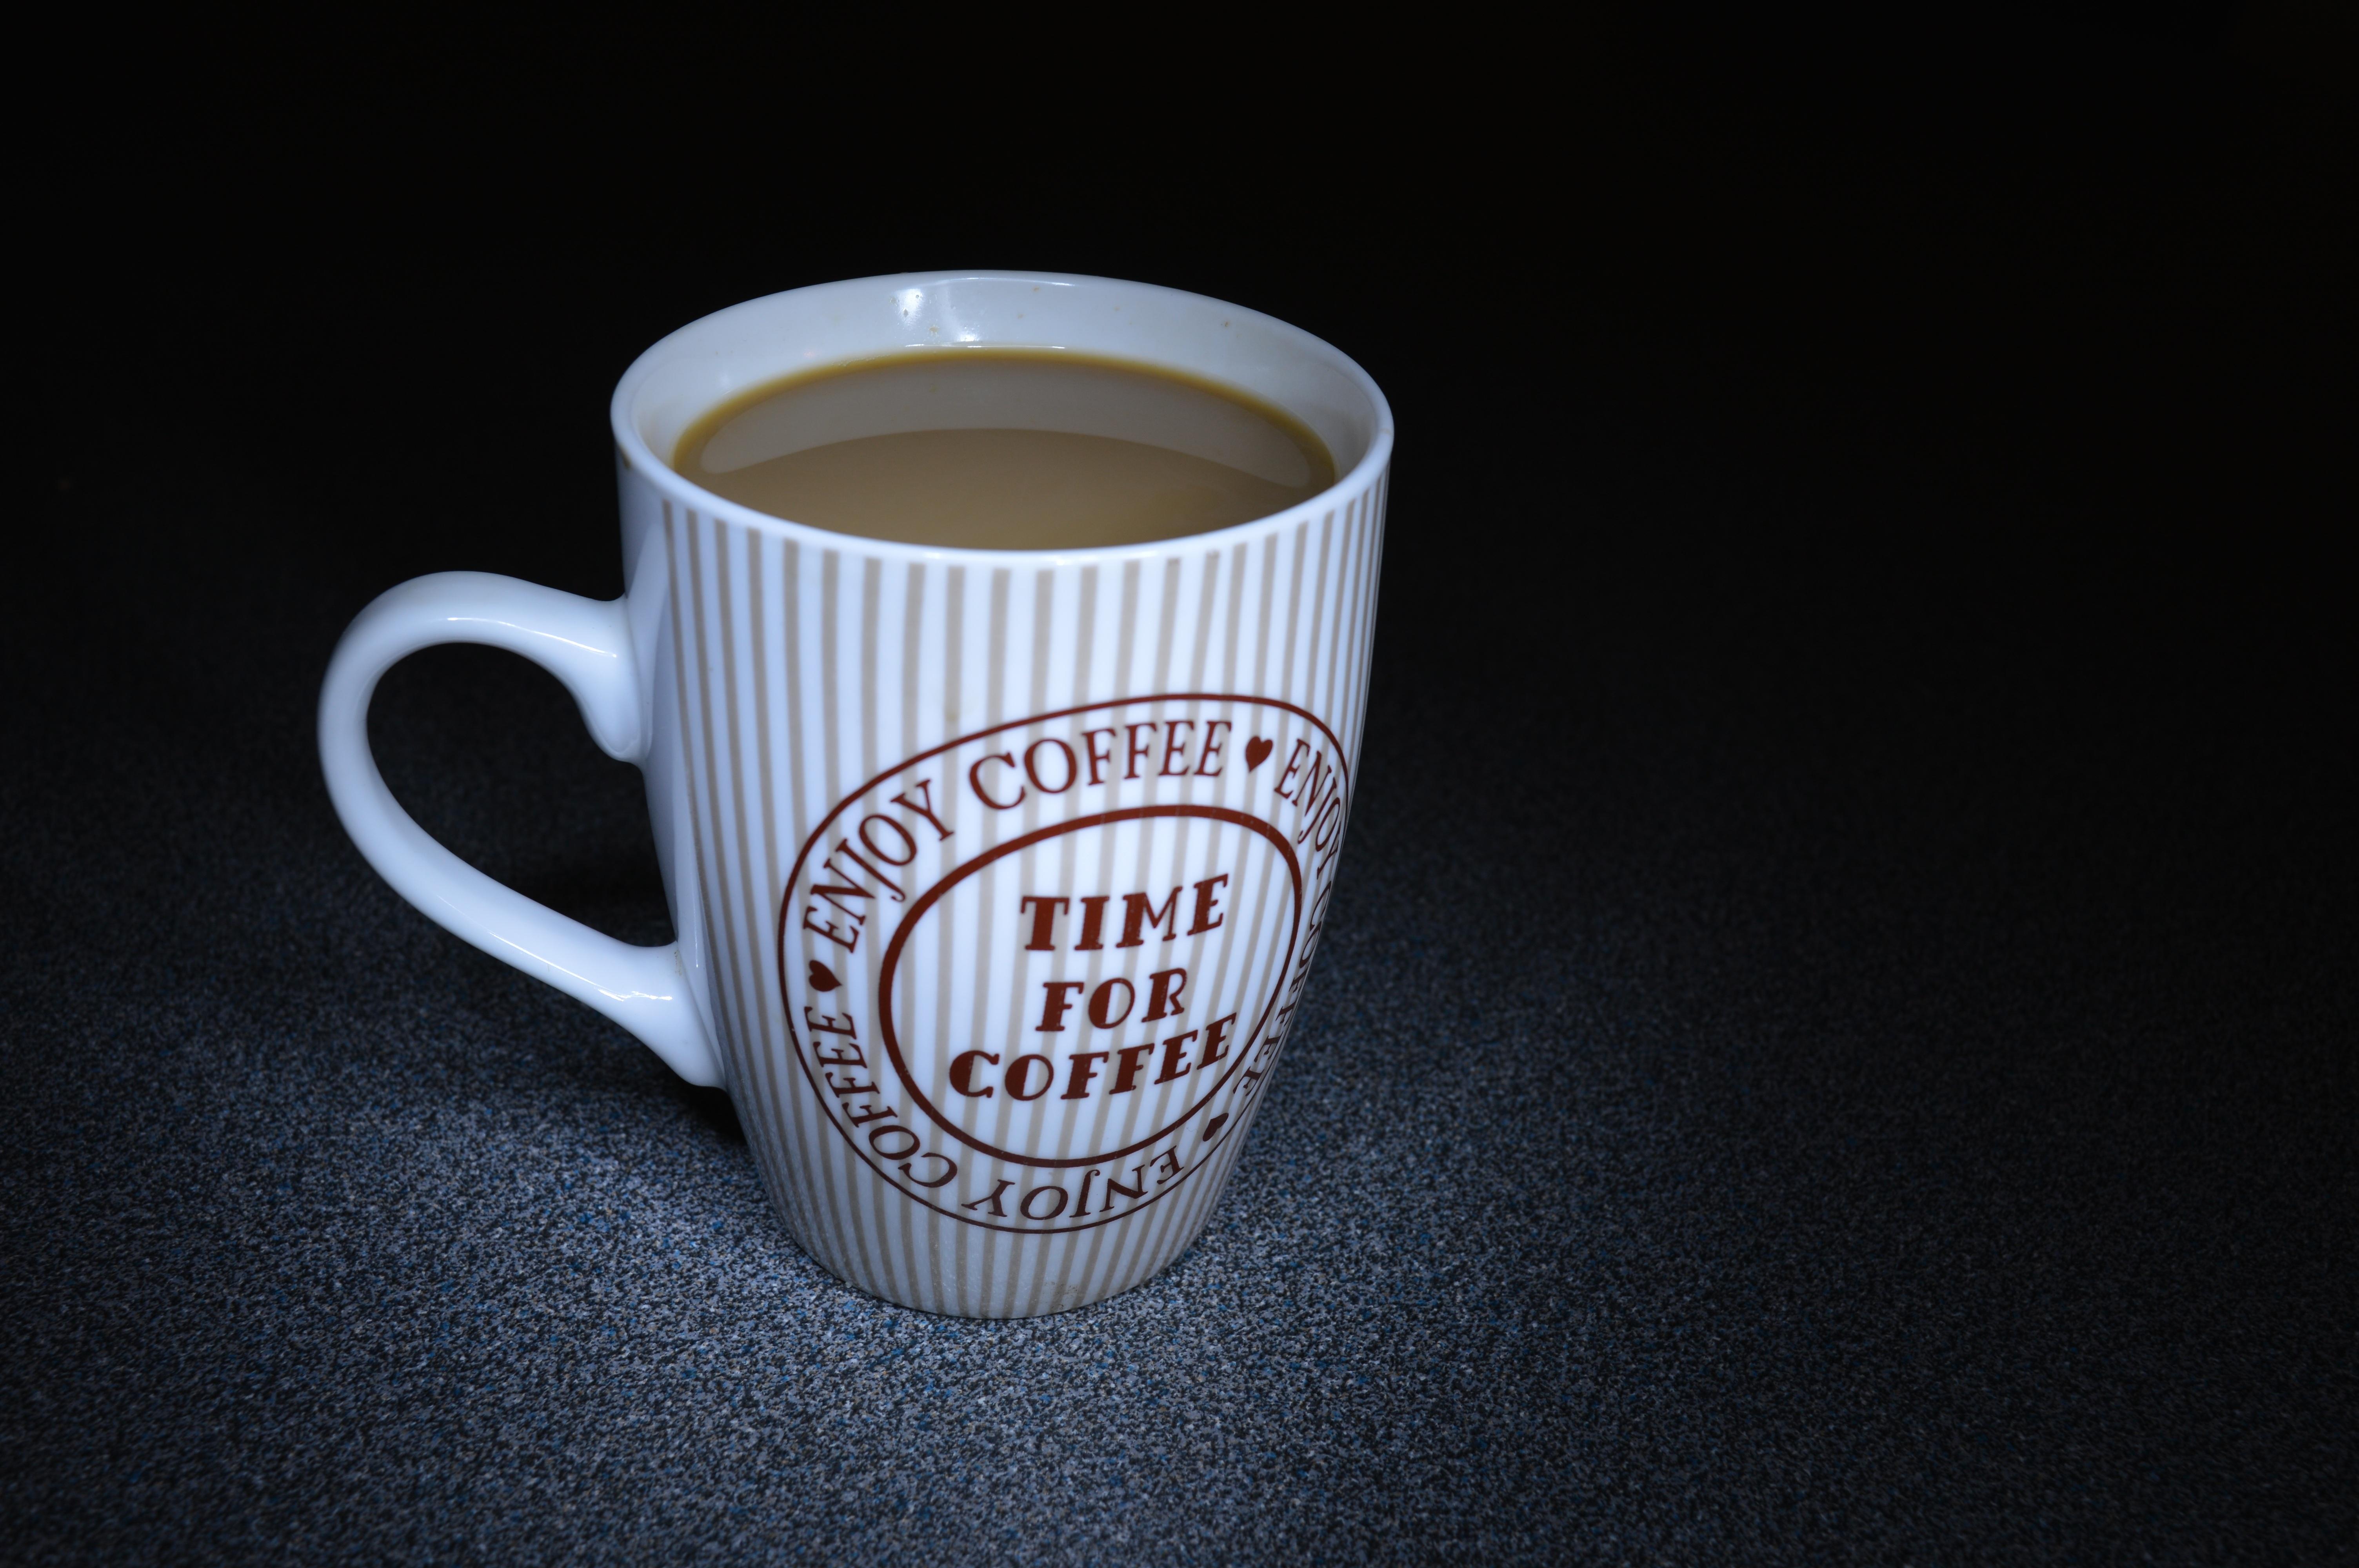 kafe kopi cangkir makanan kantor minum espreso mangkok cangkir kopi cangkir teh merek kafein relaksasi secangkir